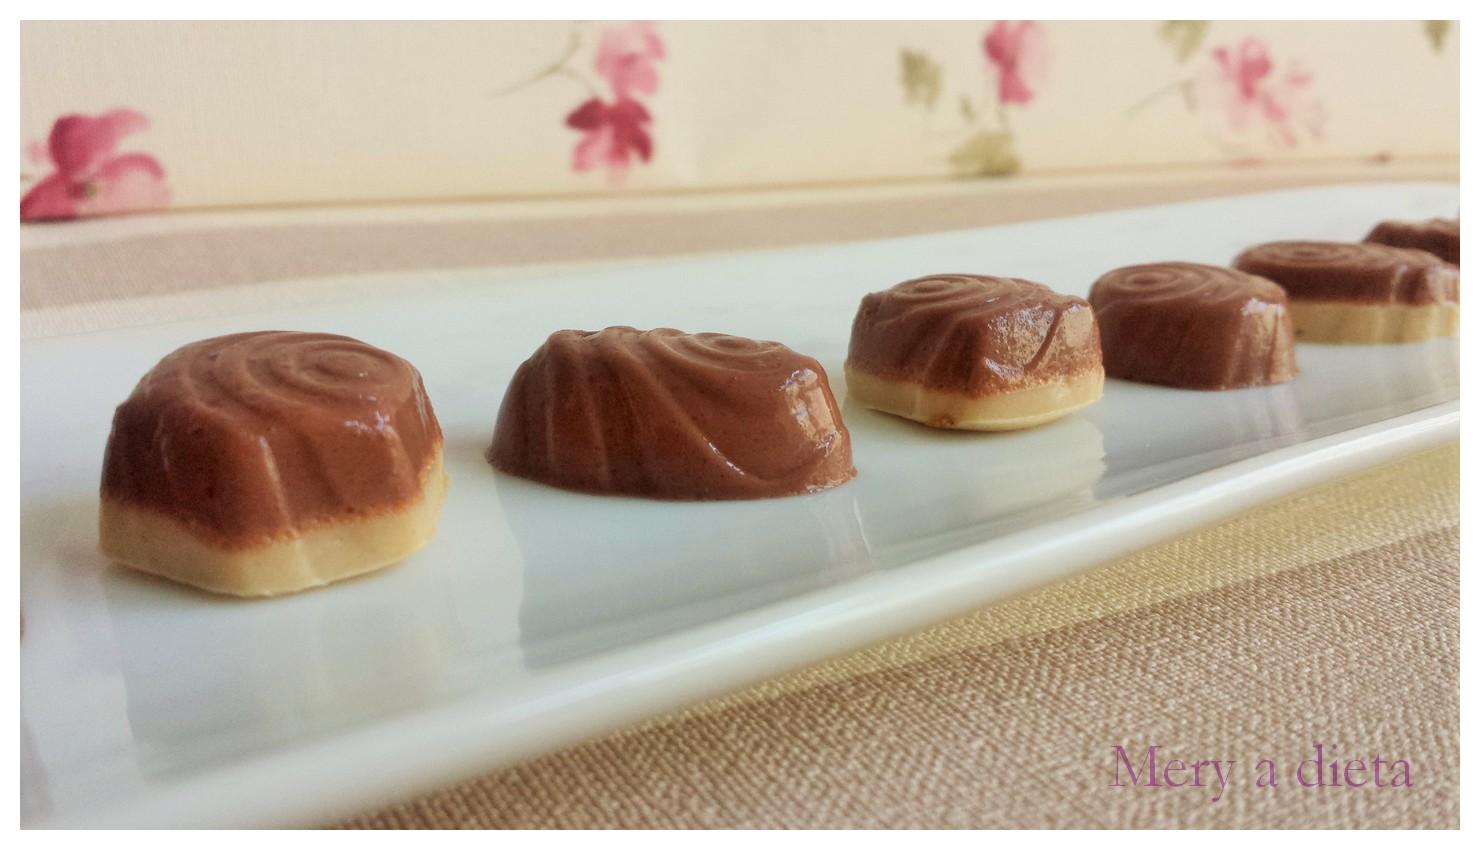 Dieta a base de chocolate